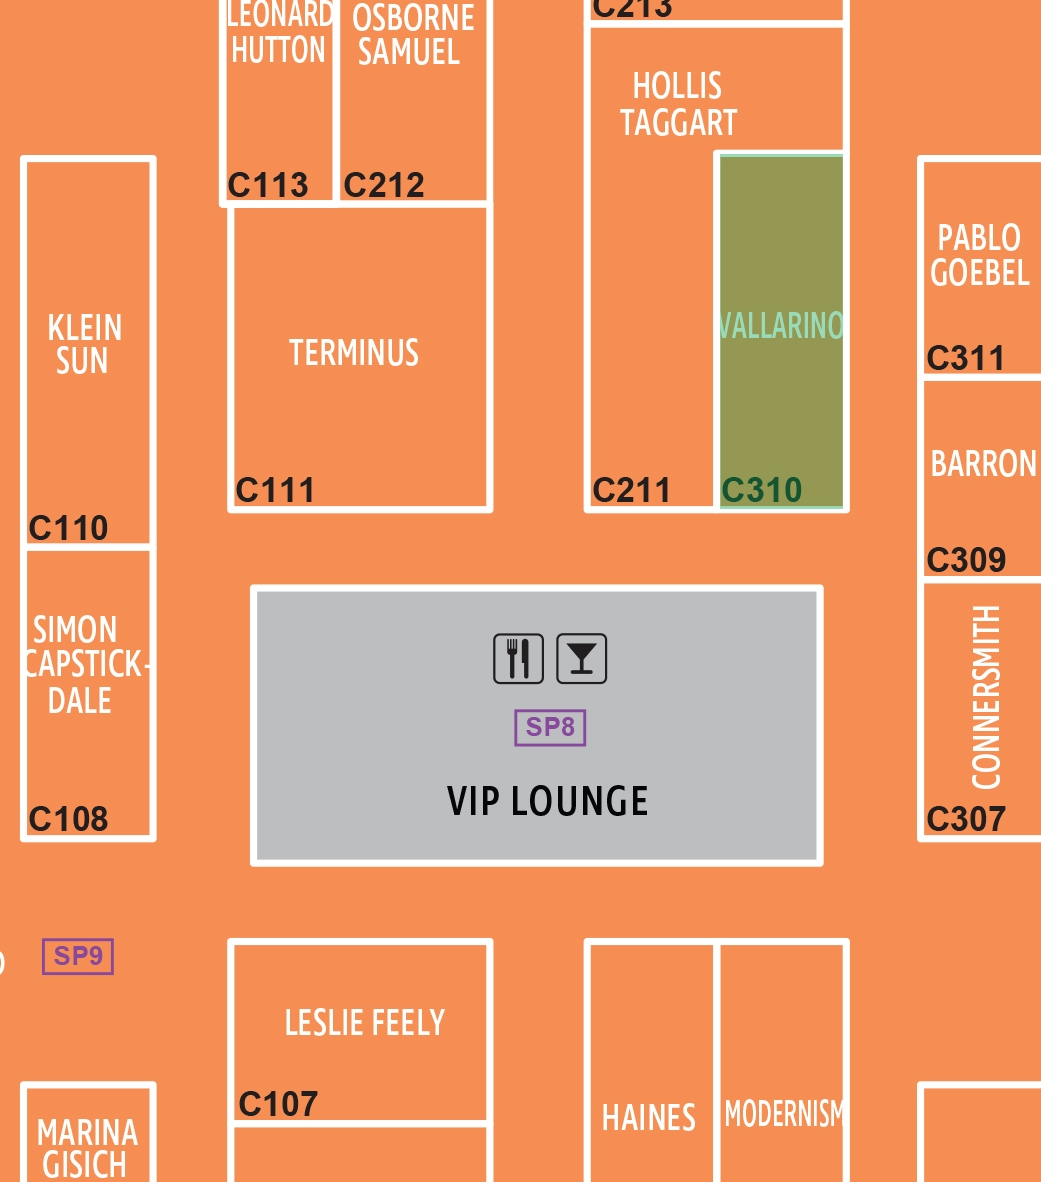 ArtMiami2016-Floorplan-Vallarino-C310.jpg